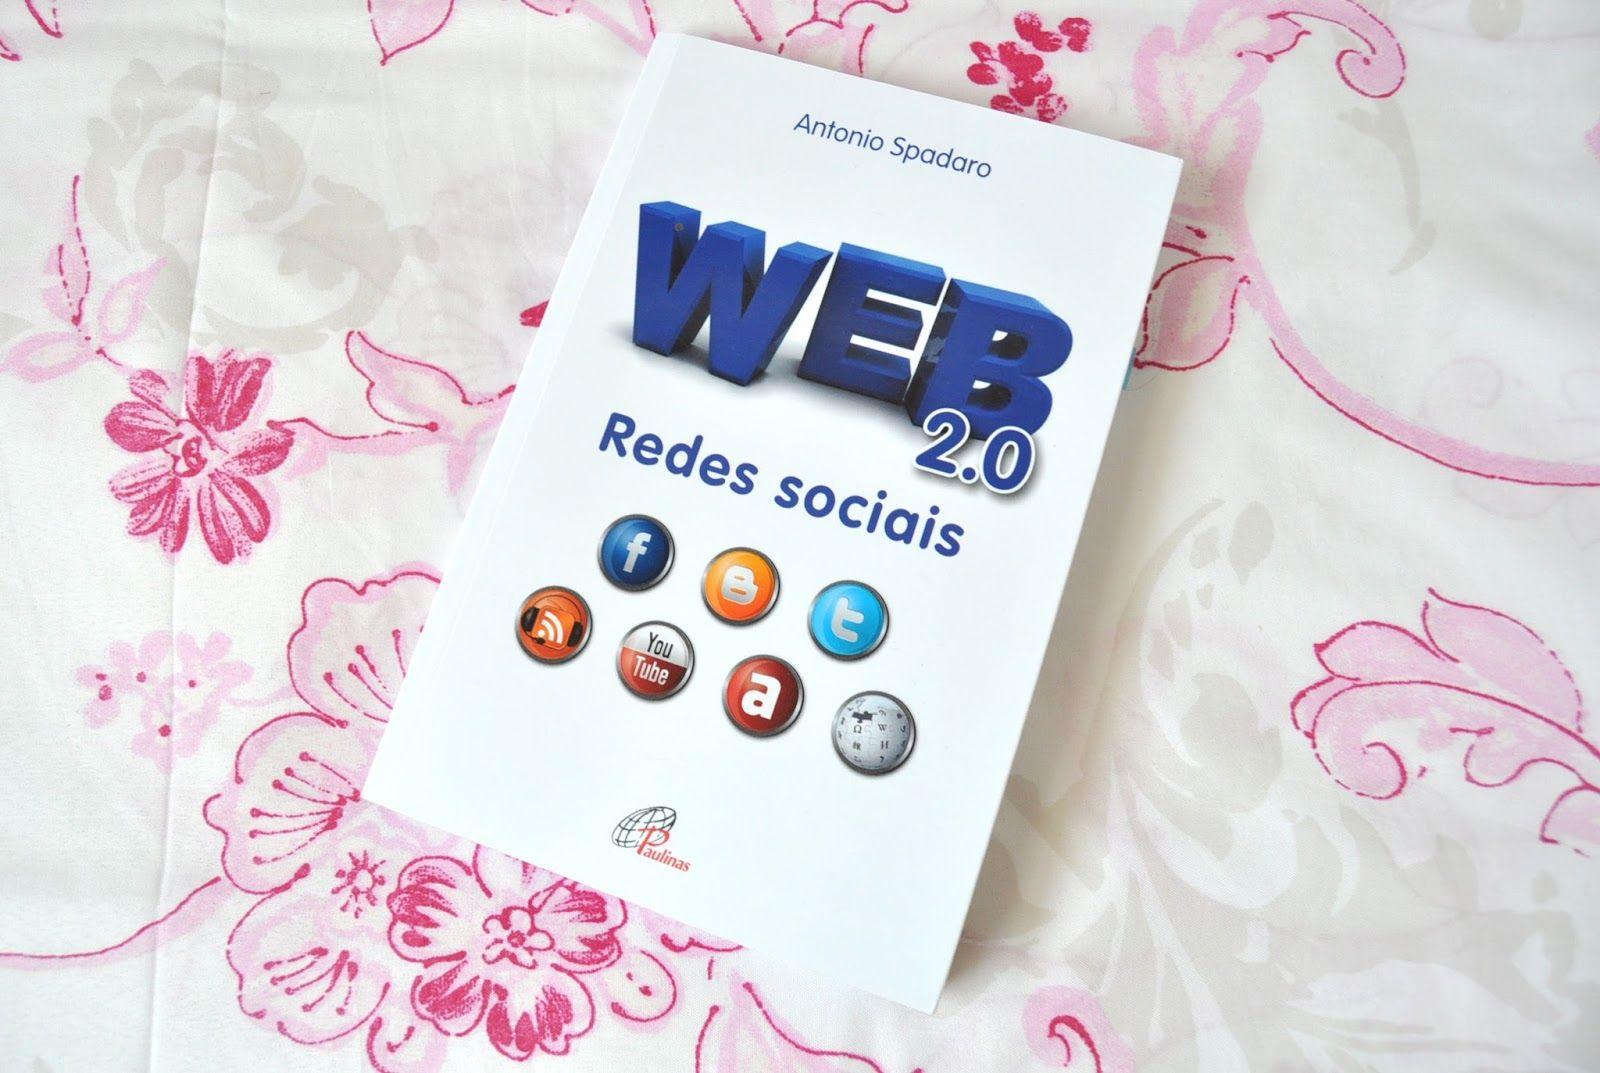 Blog: Web 2.0 Redes Sociais - Antonio Spadaro | #camilecarvalho